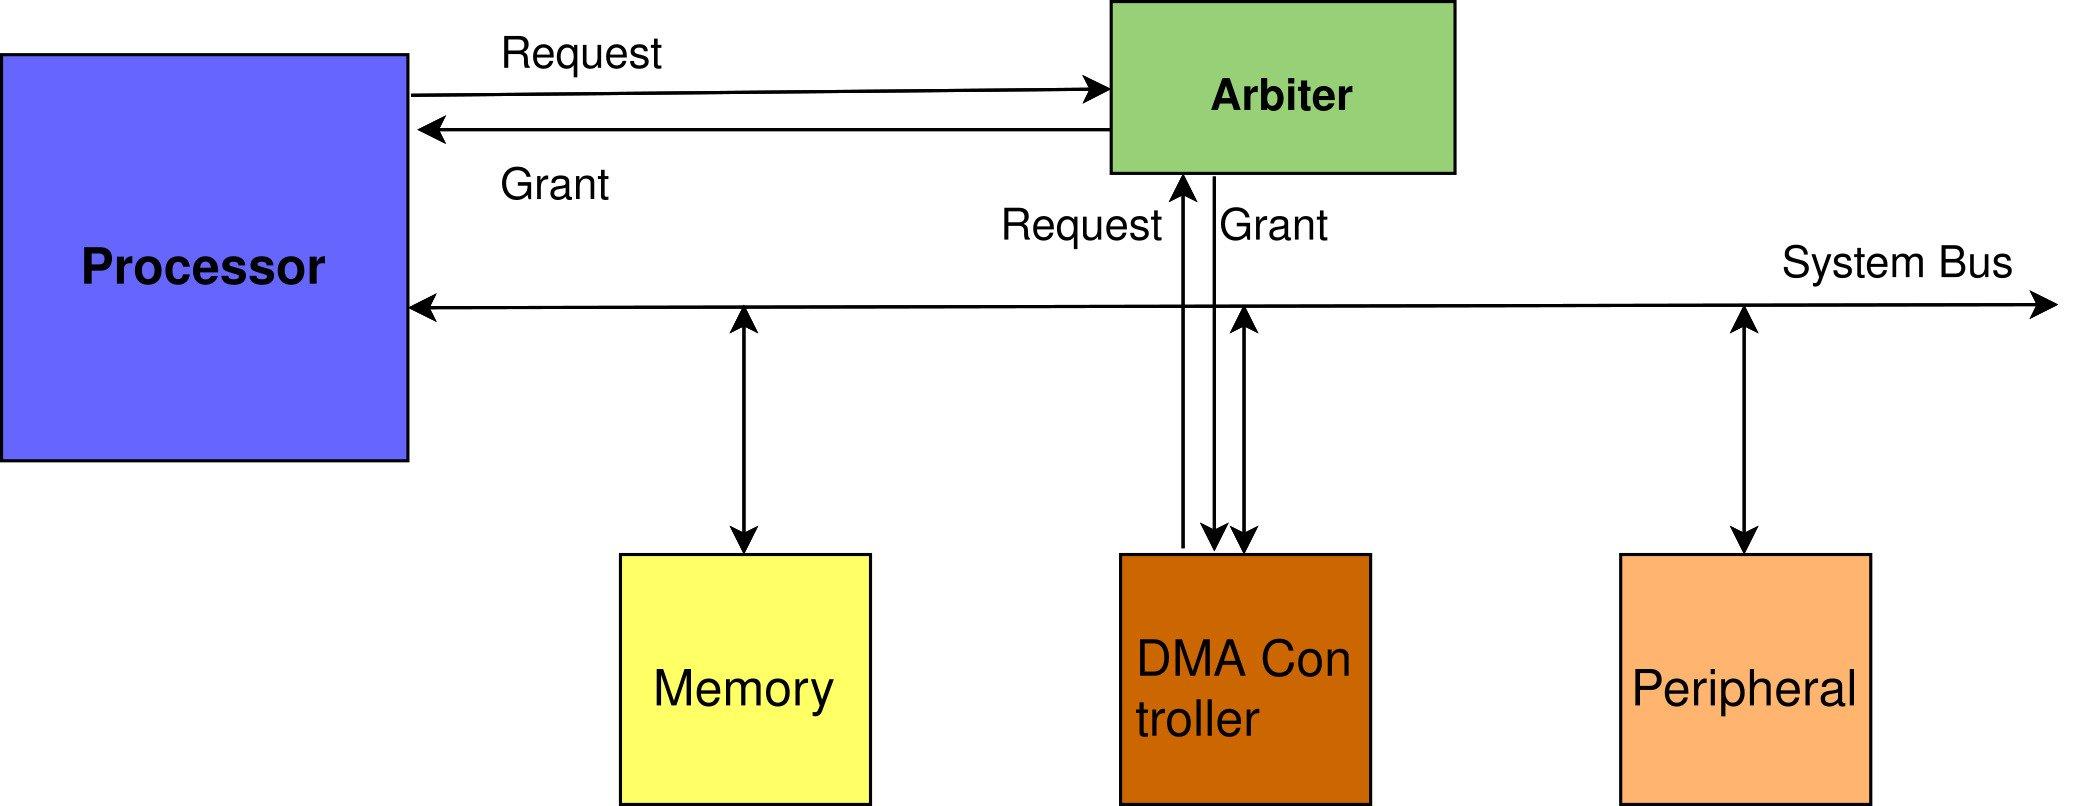 bus arbitration dma